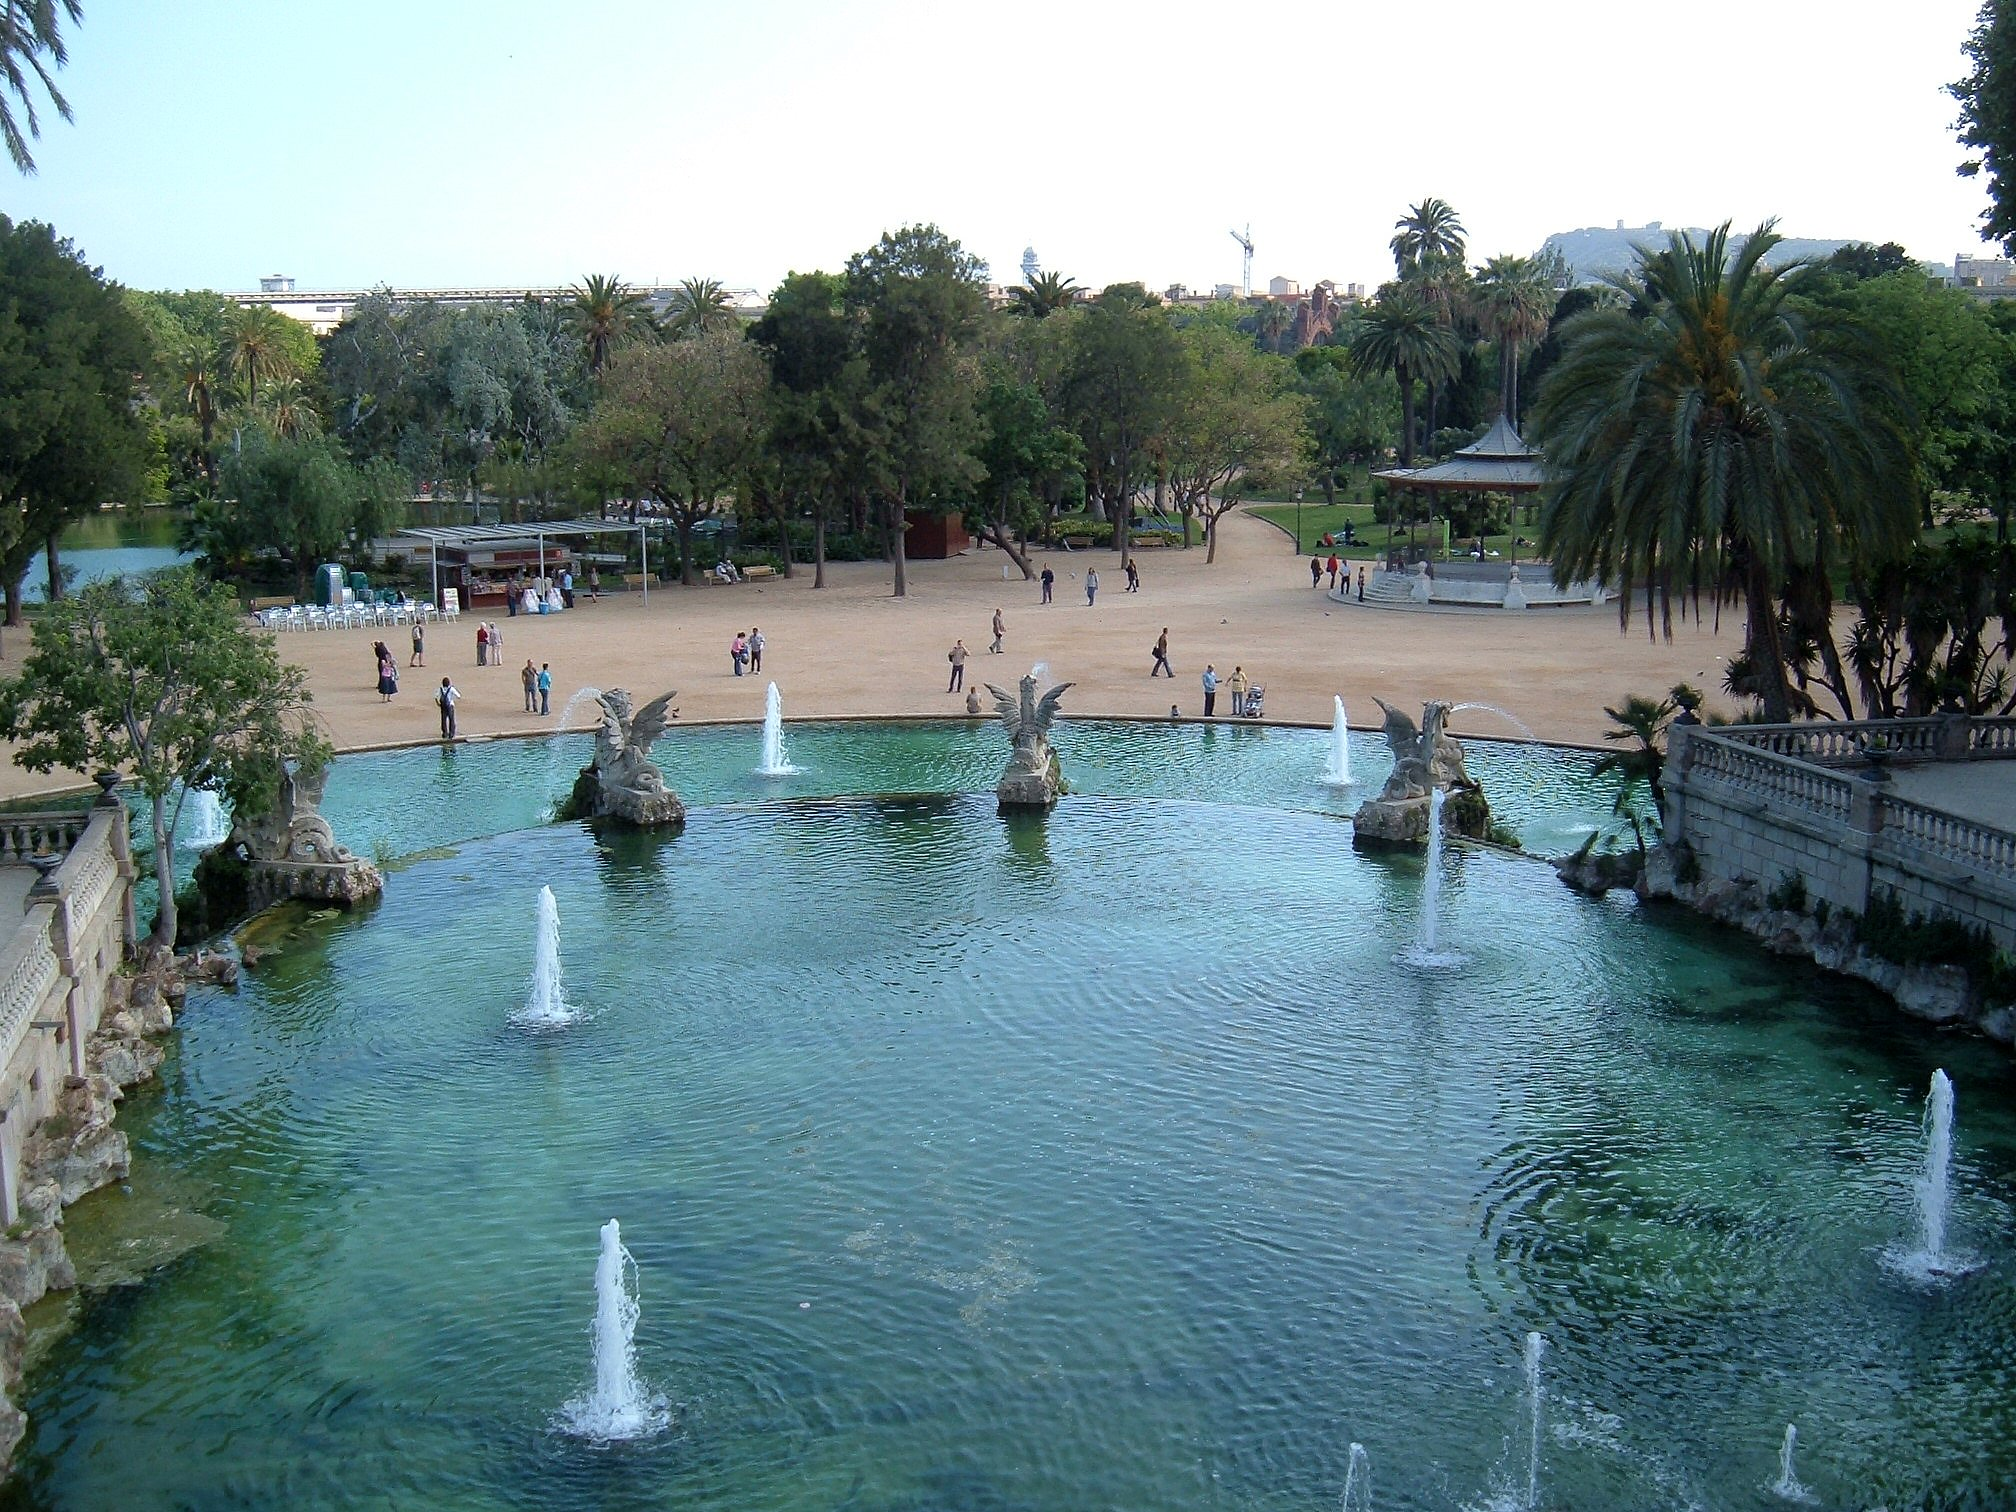 b002-barcelona-spain-parc-de-la-ciutadella-cascada